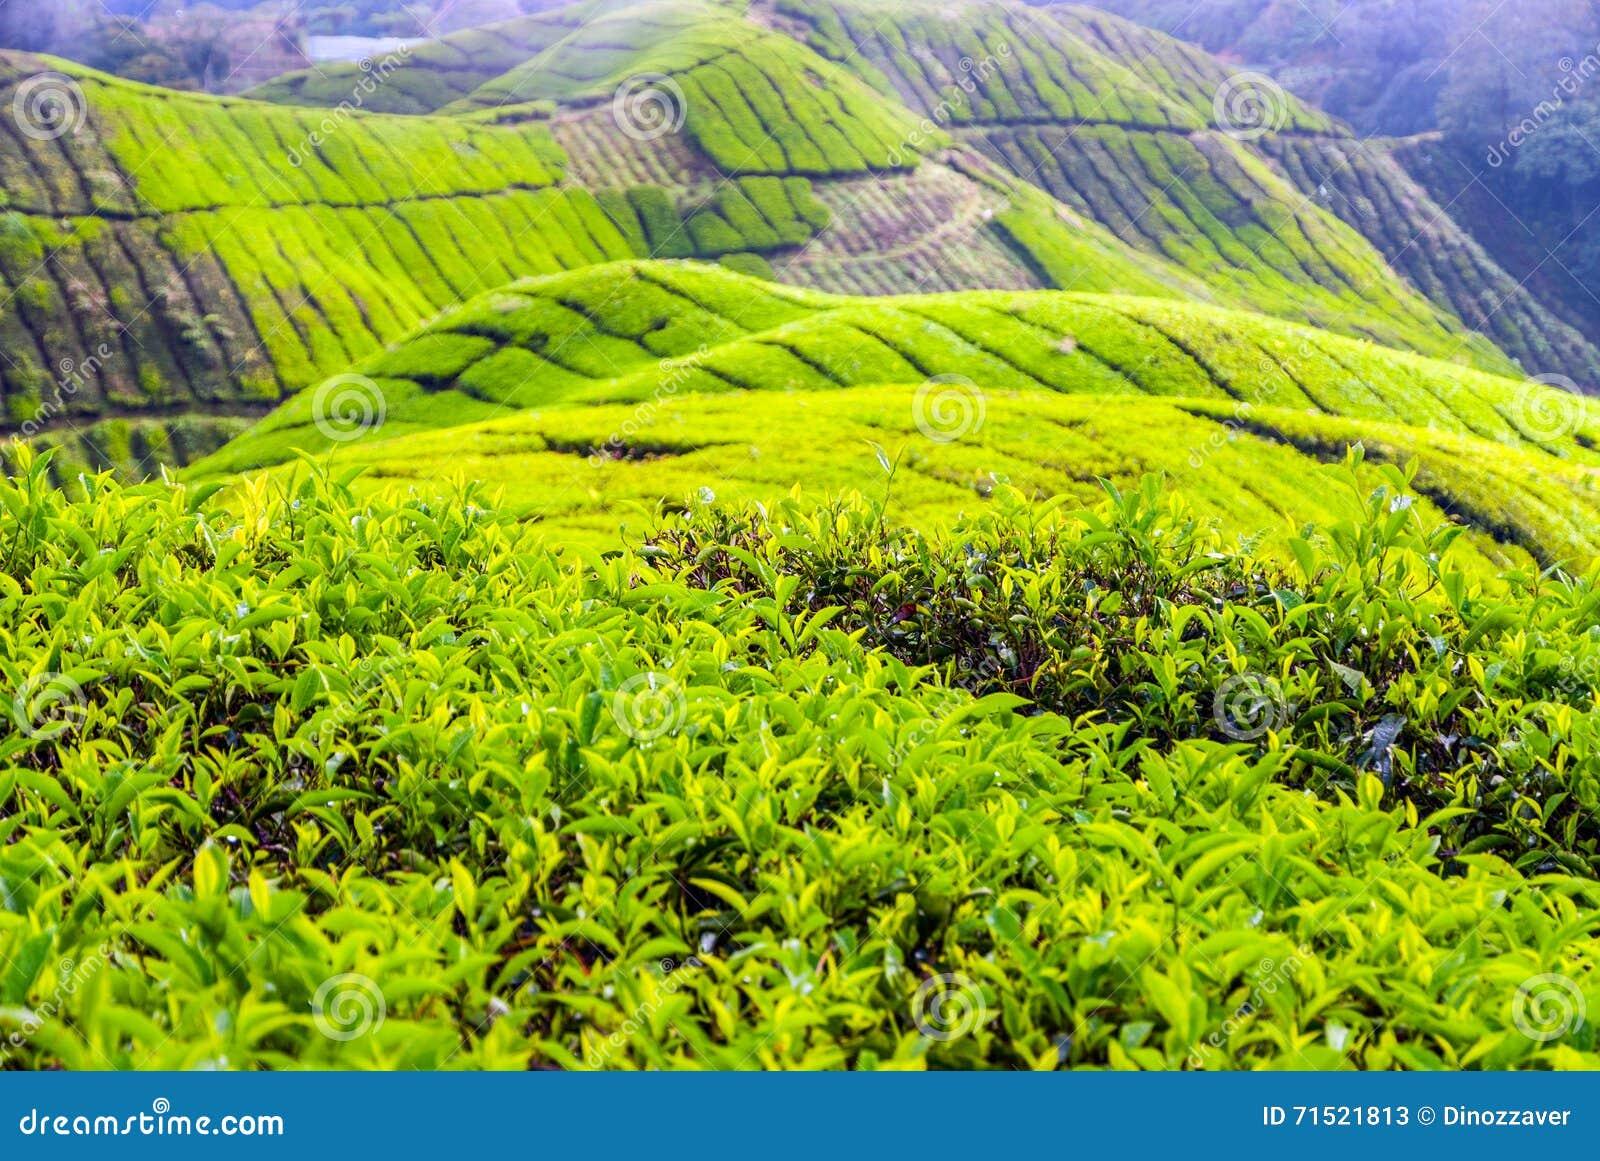 Tea Plantation In Cameron Highlands, Malaysia Stock Image ...